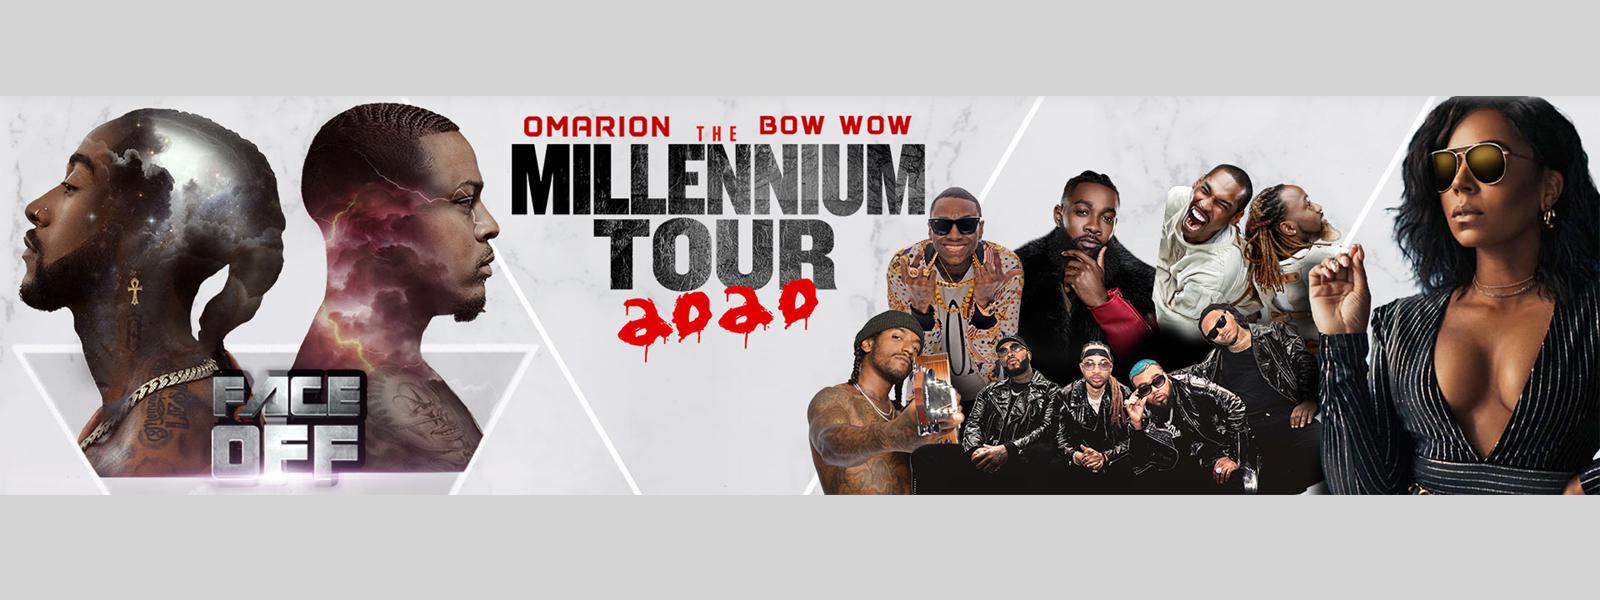 RESCHEDULED: The Millennium Tour 2020